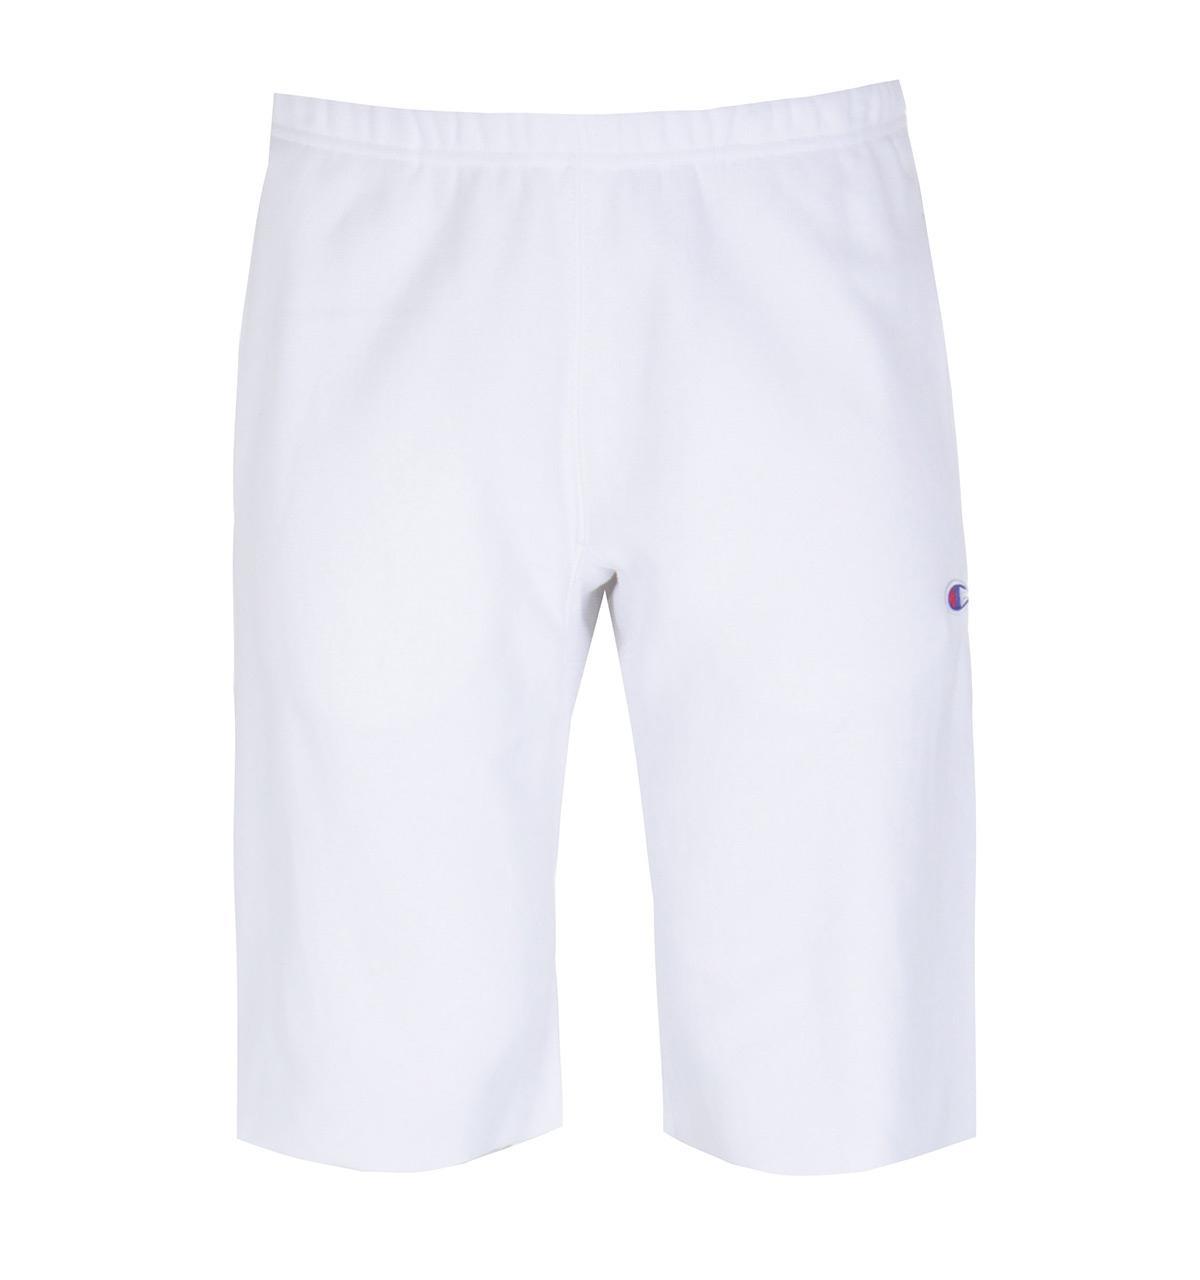 ec6702164bb Lyst - Champion Reverse Weave White Sweat Shorts in White for Men